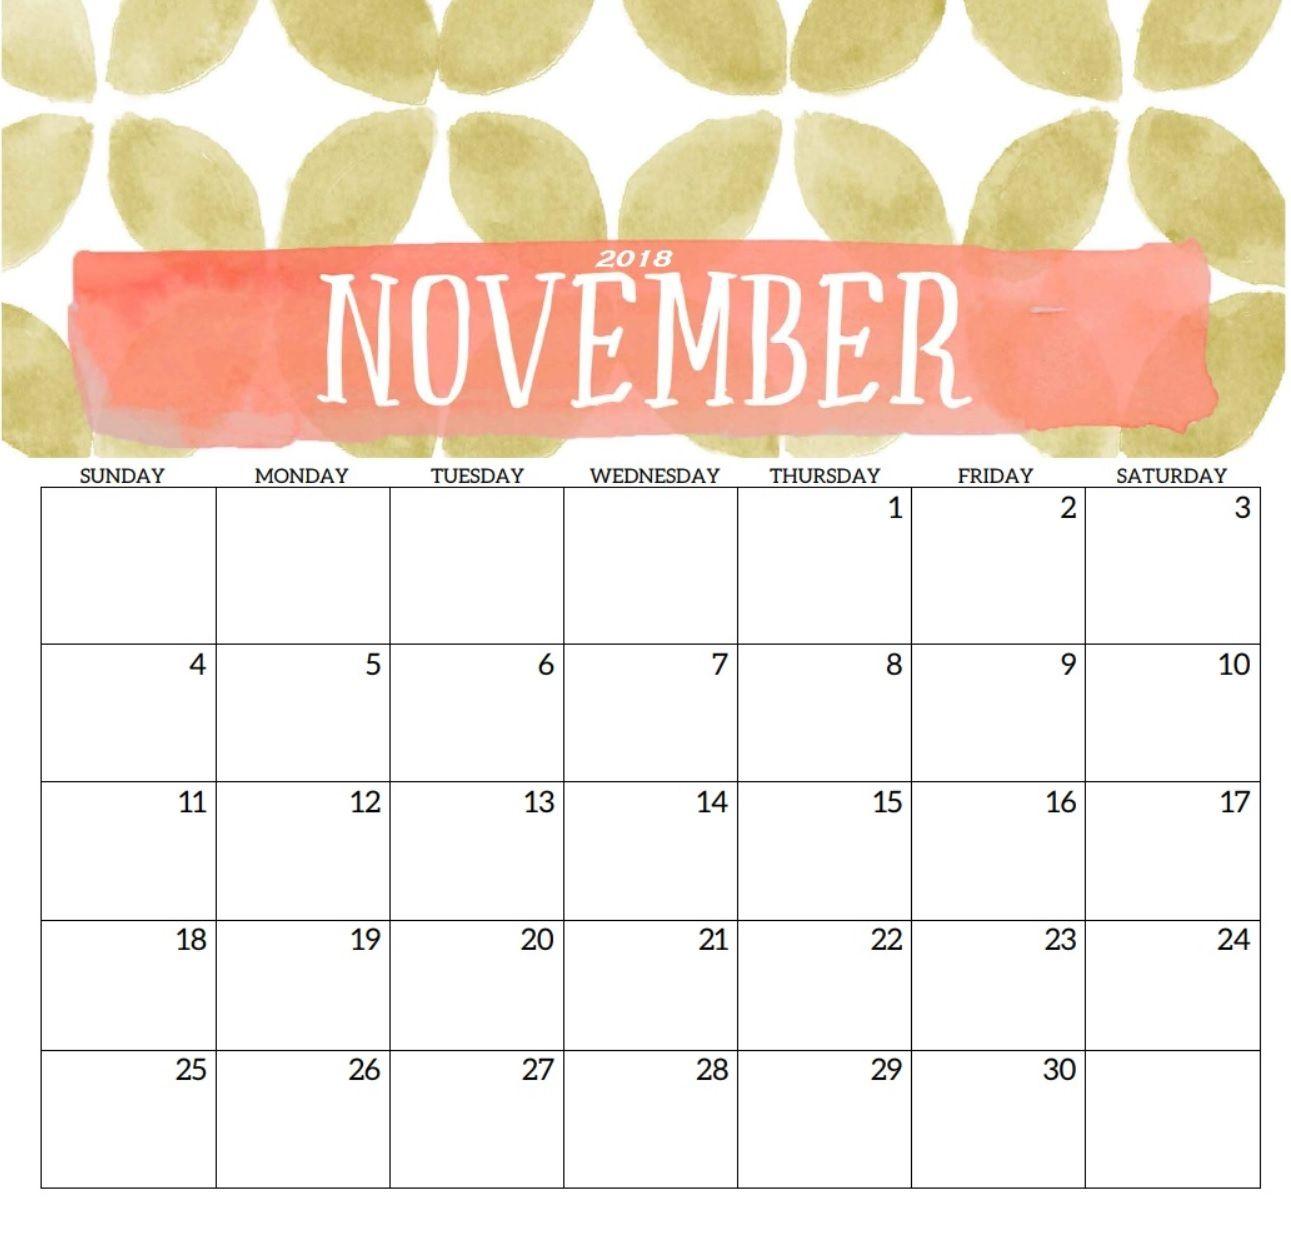 Calendar November 2018 Printable Template November 2018 Calendar